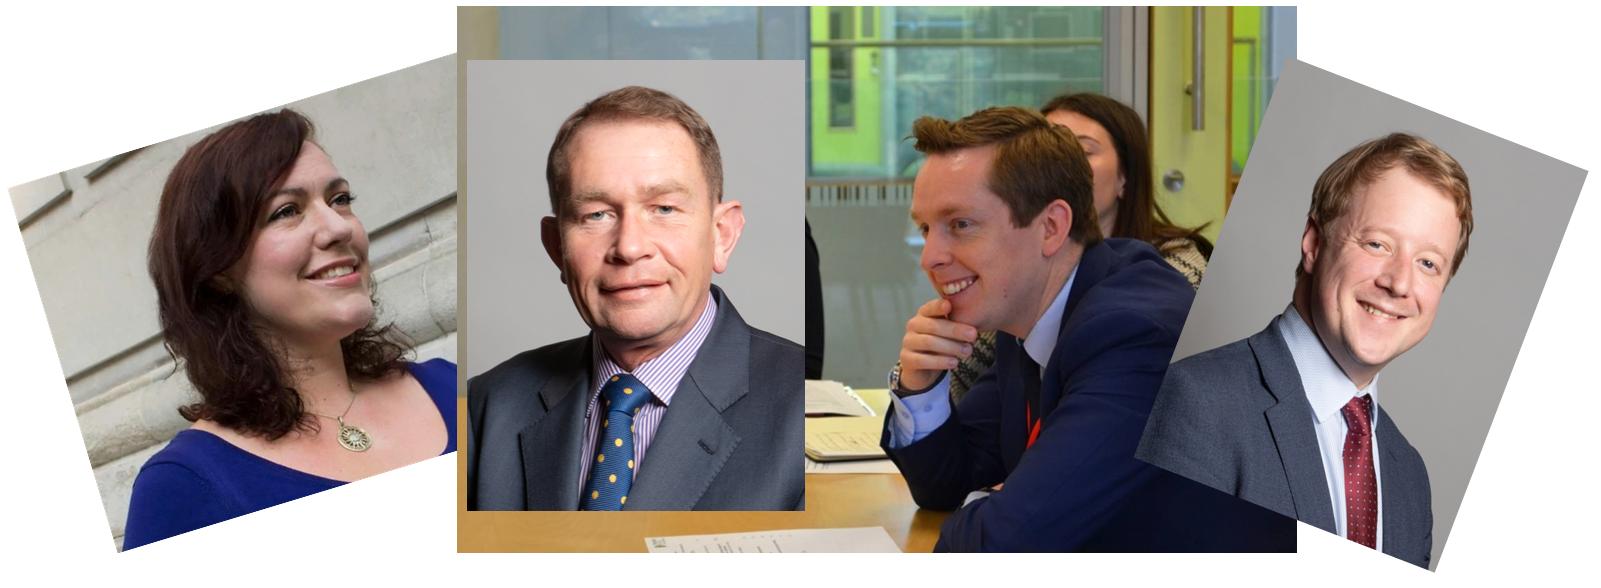 Collage image of Alicia Kearns MP, Philip Hollobone MP, Tom Pursglove MP, Paul Bristow MP